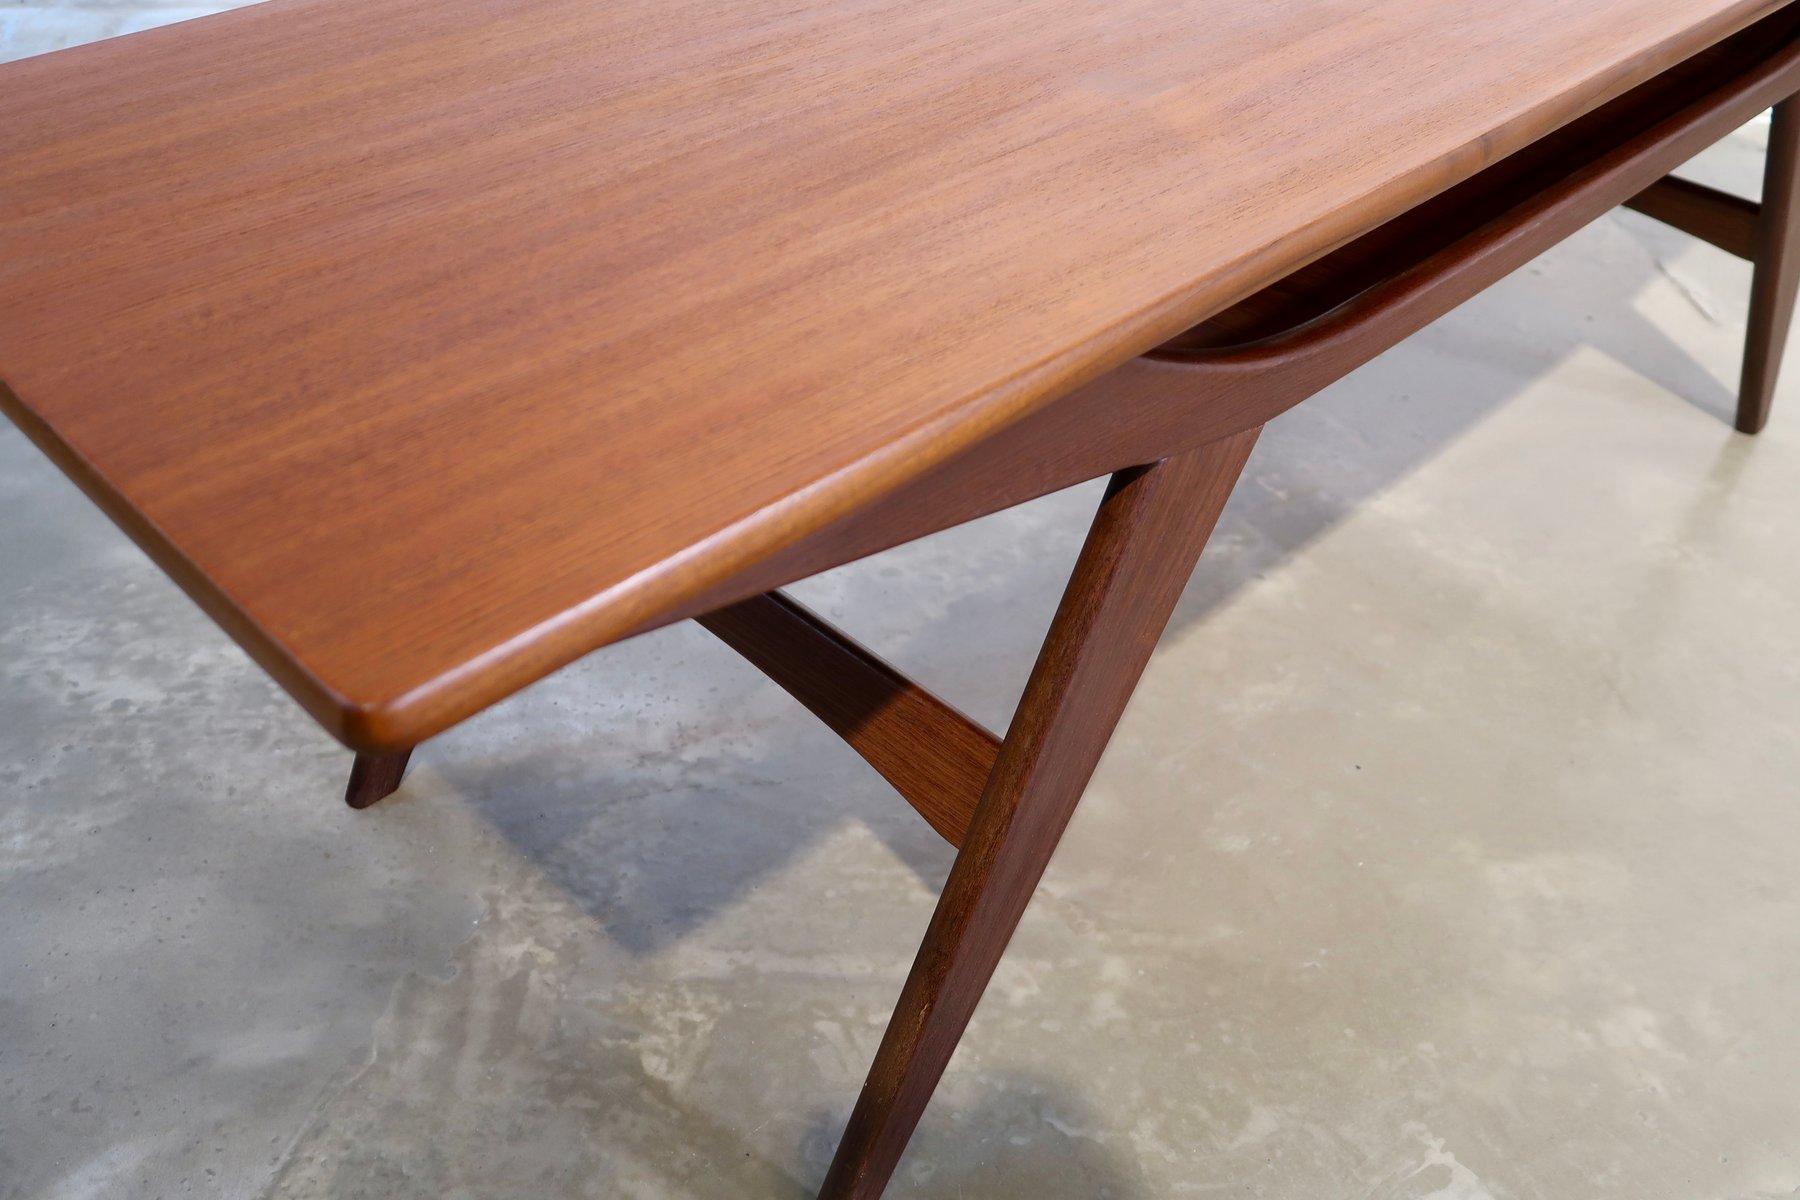 table basse en teck danemark 1960s en vente sur pamono. Black Bedroom Furniture Sets. Home Design Ideas